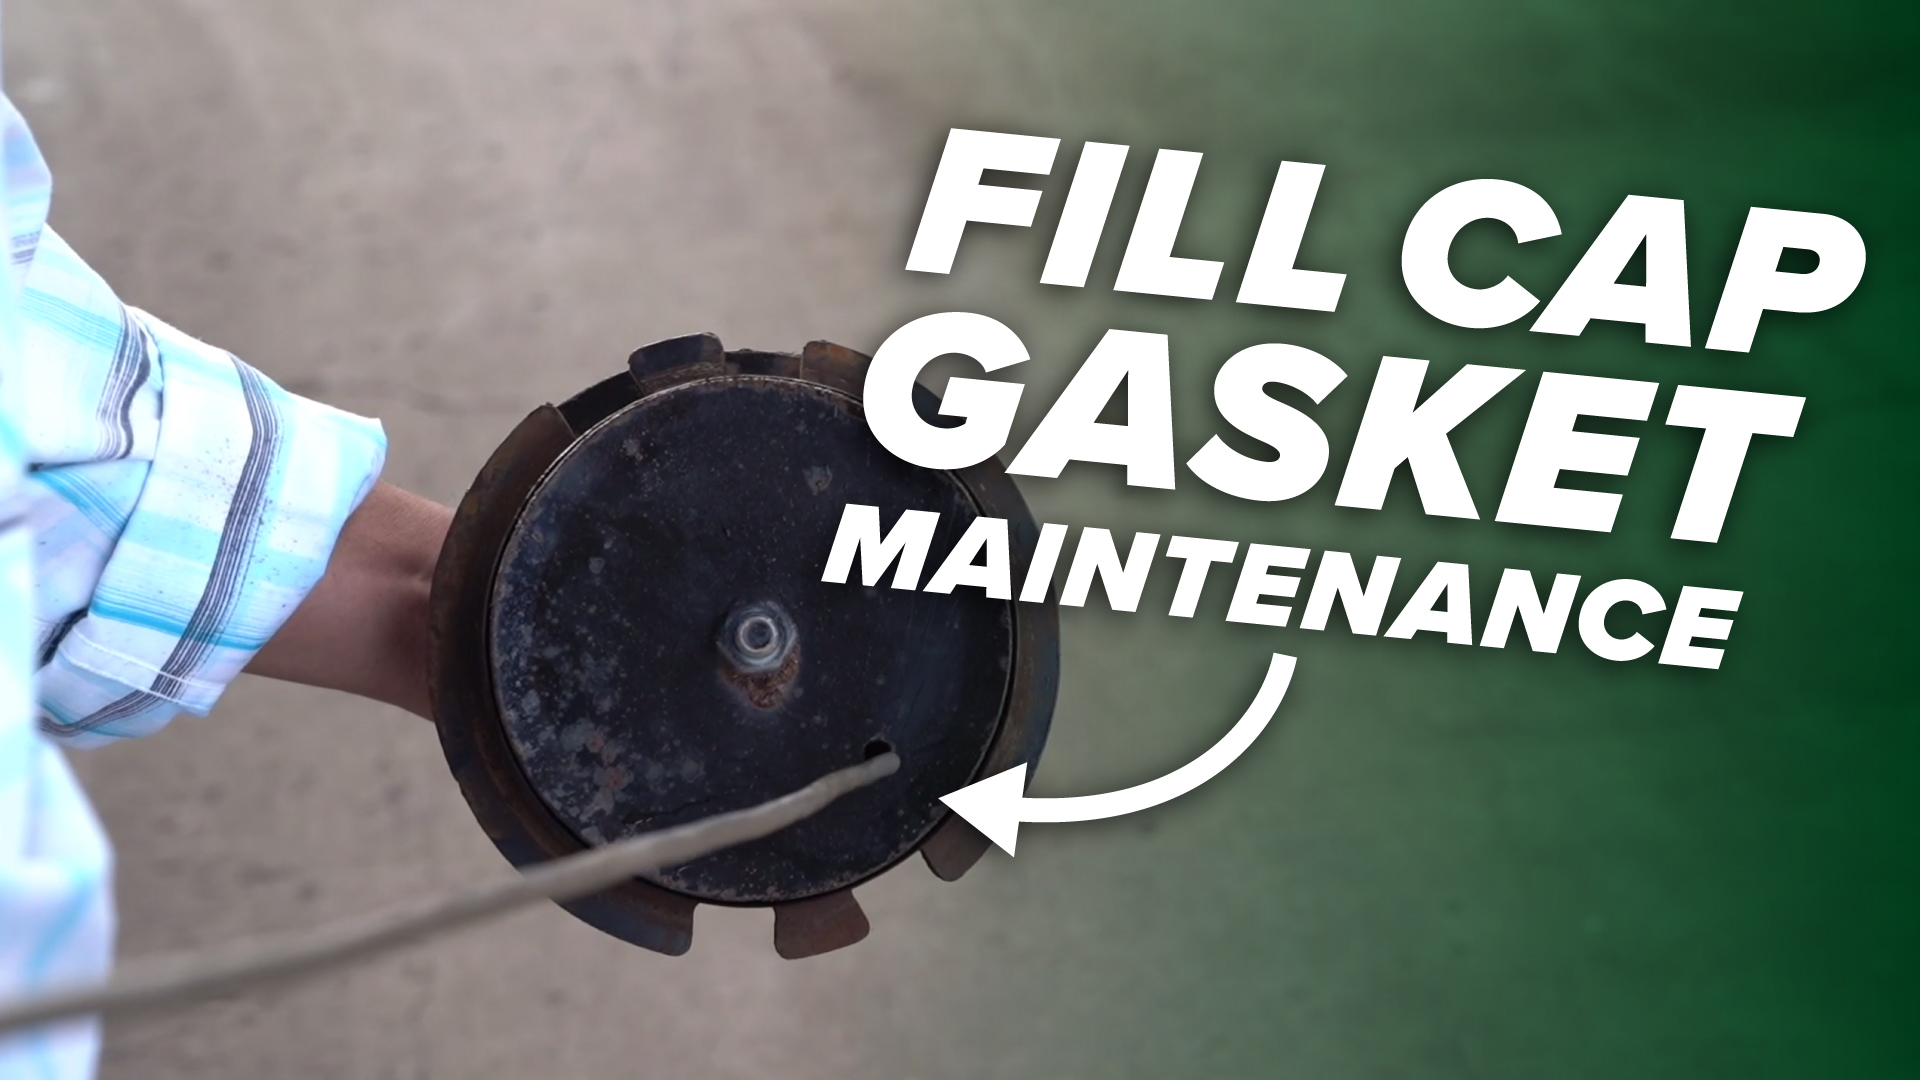 DB-Academy - Fill Cap Gasket Maintenance